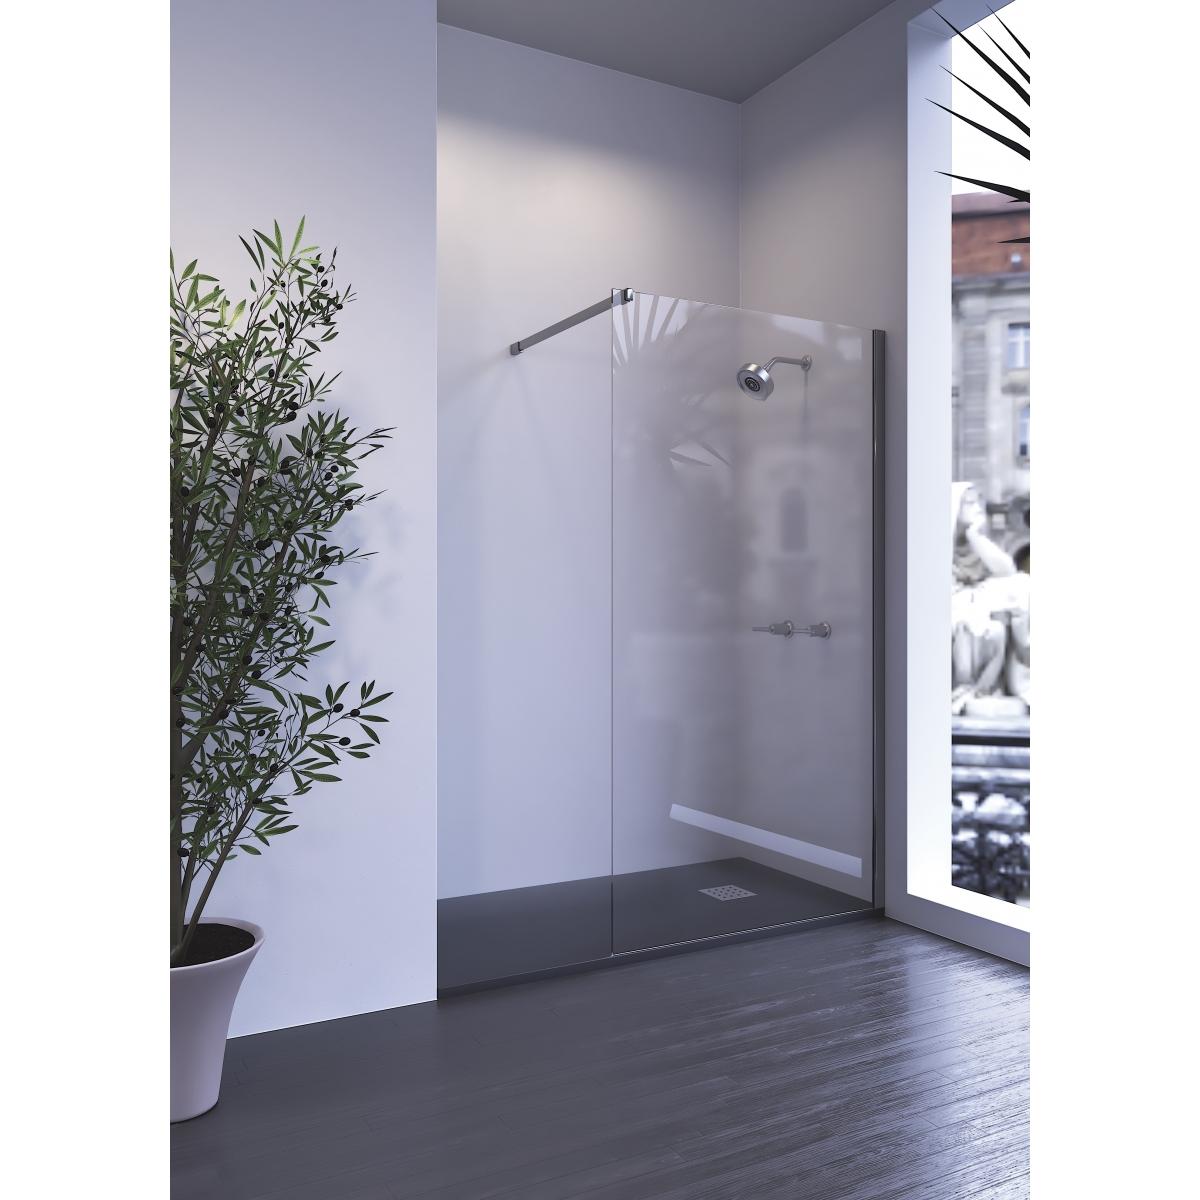 Mampara económica para ducha Nilo - Mamparas de duchas - Marca Anna Bagno